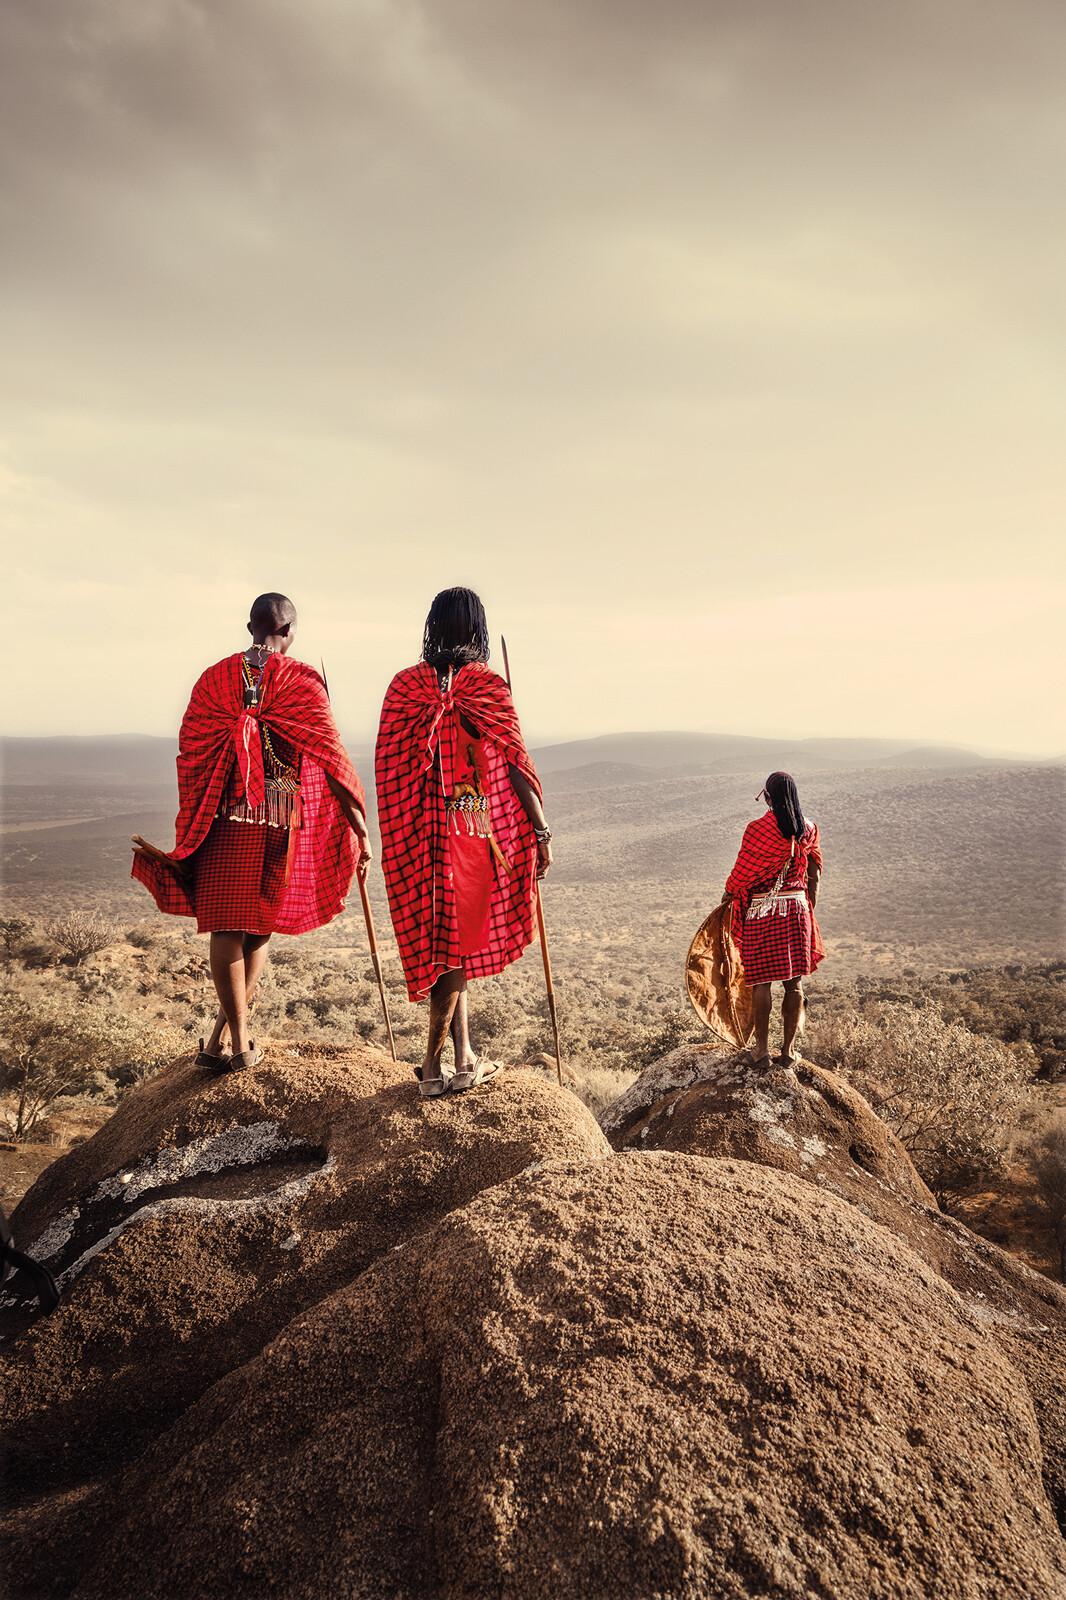 Maasai II - Daniel Kordan